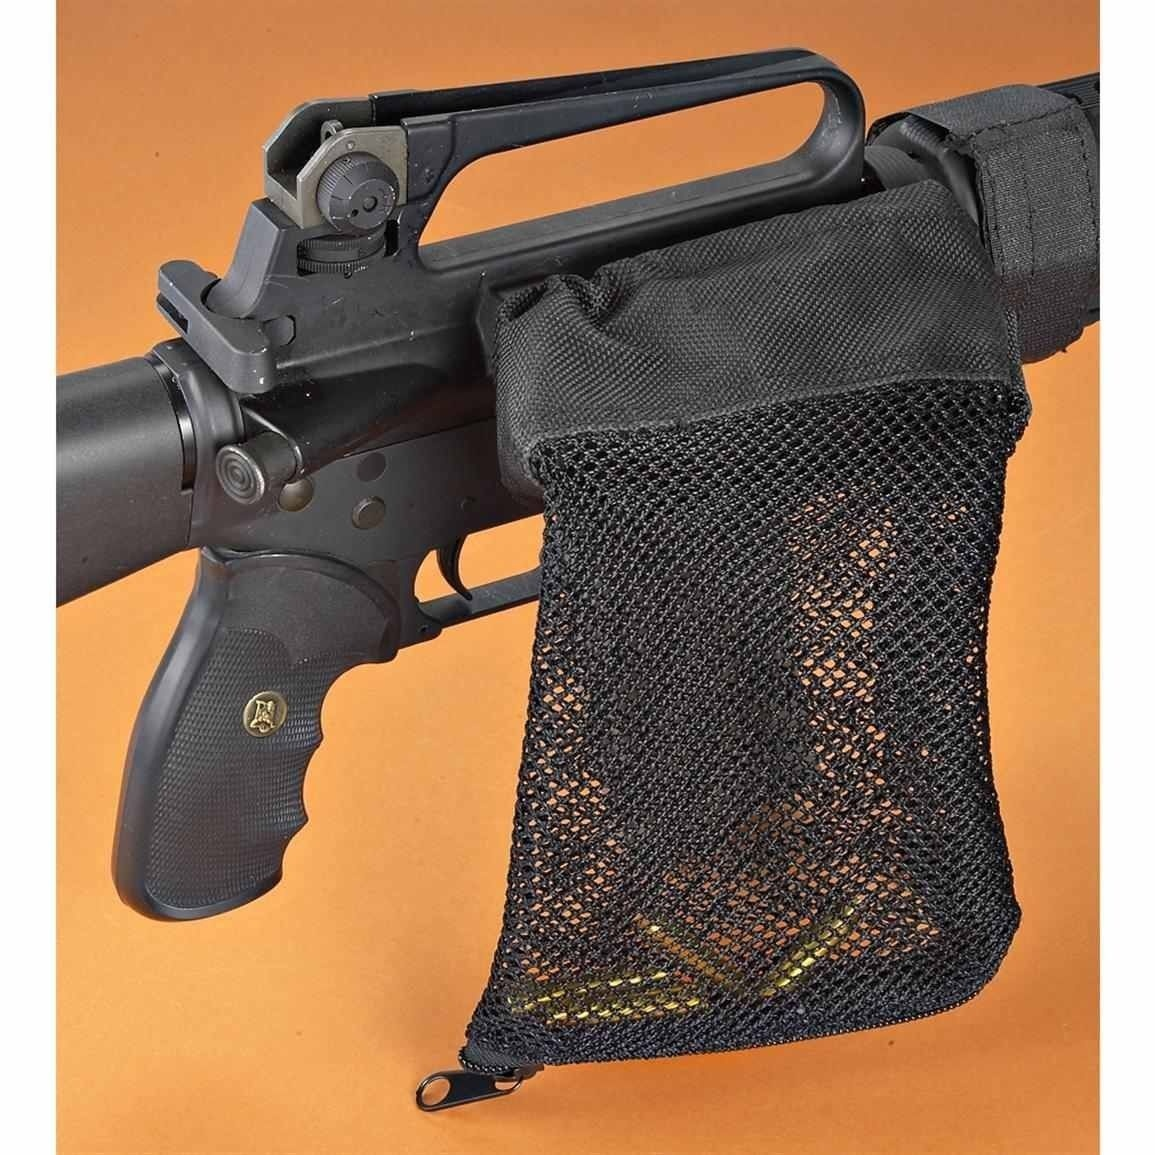 Hunting tactical M4 military army shooting Brass ar15 Bullet Catcher Rifle Gun Mesh Trap Shell Catcher Wrap Around Zipper Bag